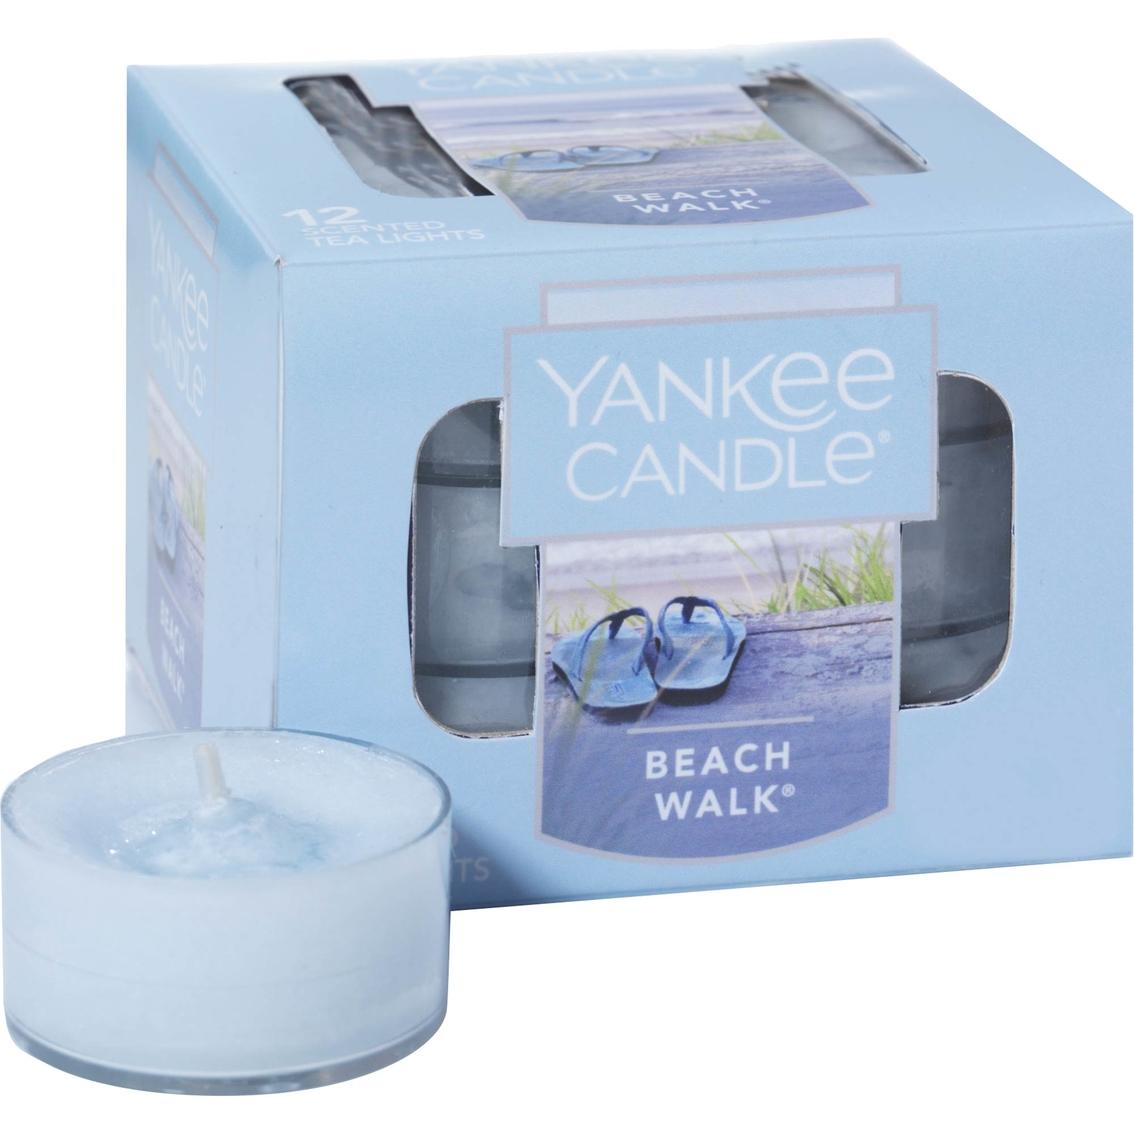 Yankee Candle Beach Walk Tea Light Candles 12 pk.